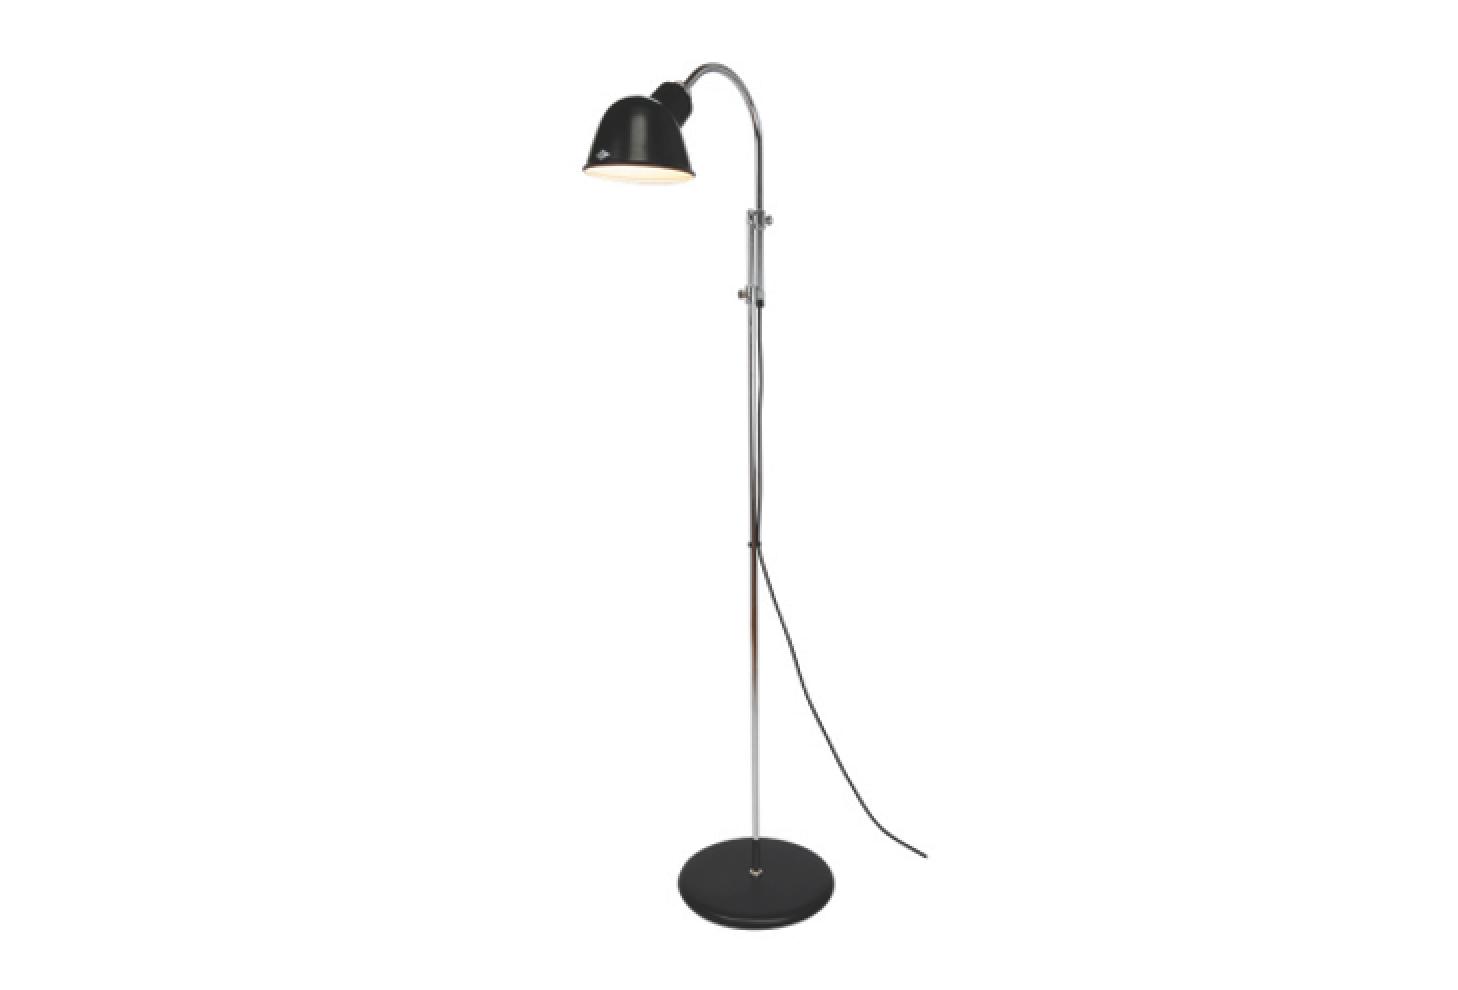 ginger floor lamp black remodelista 1 17